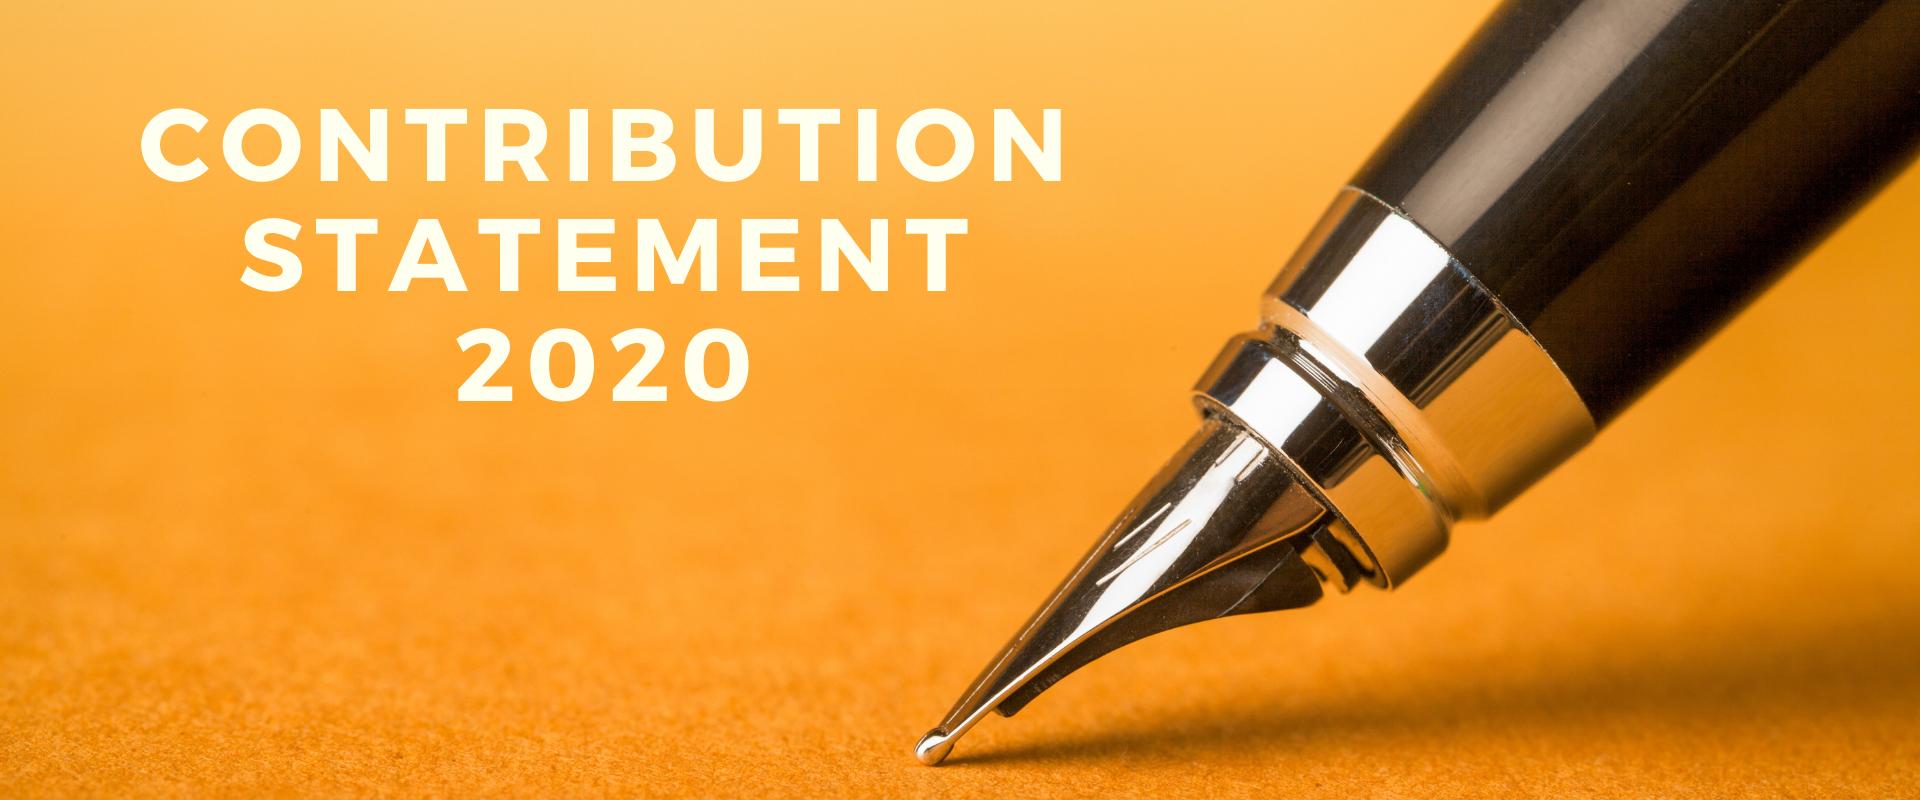 Contribution Statement 2020